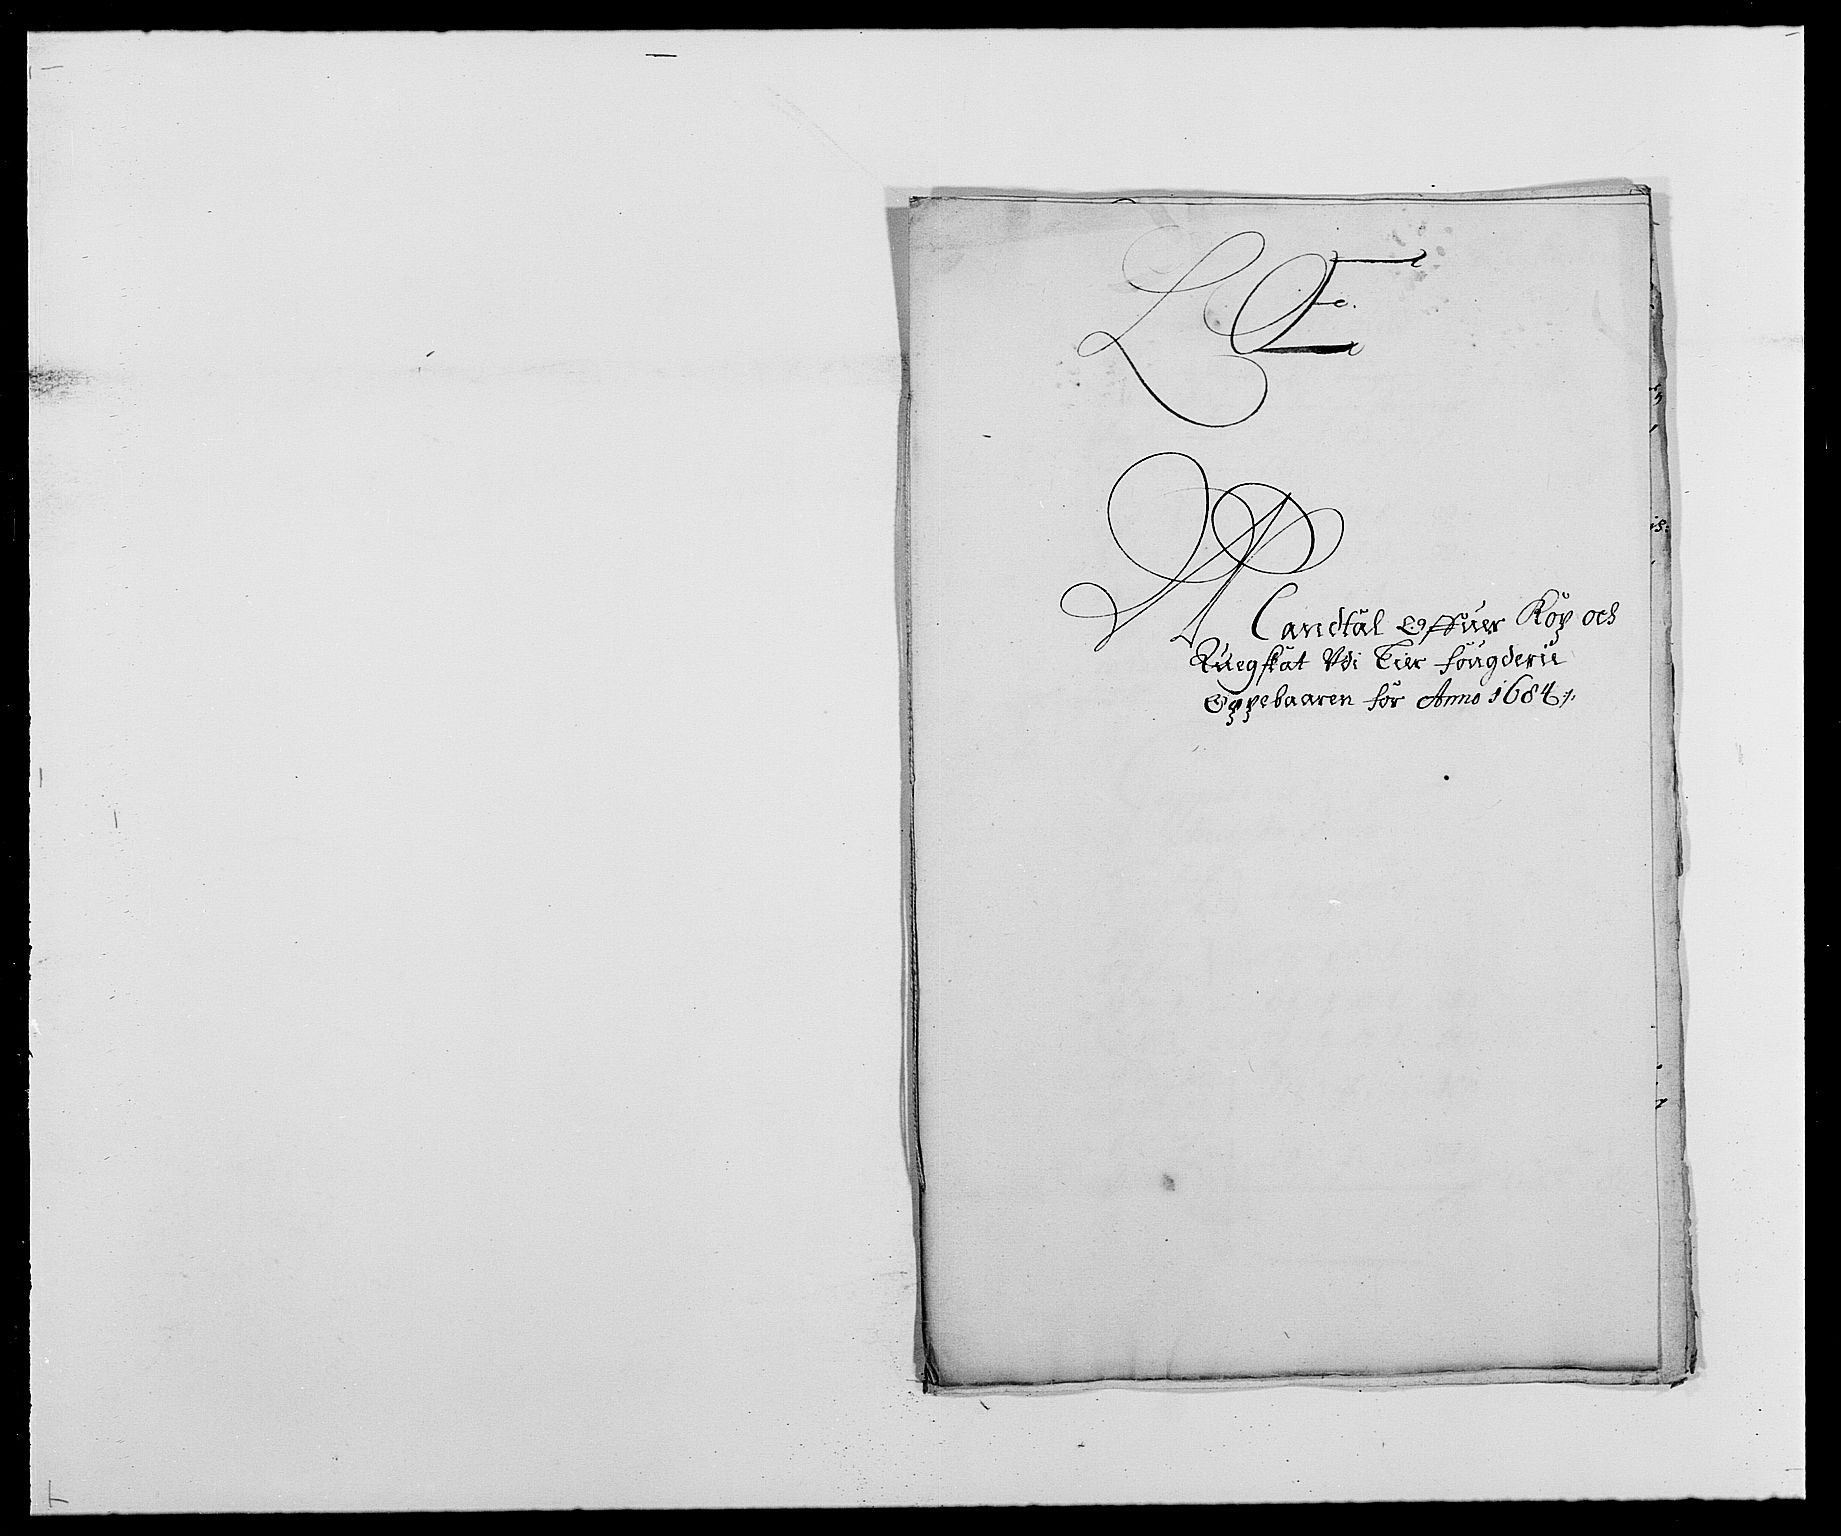 RA, Rentekammeret inntil 1814, Reviderte regnskaper, Fogderegnskap, R27/L1687: Fogderegnskap Lier, 1678-1686, s. 137